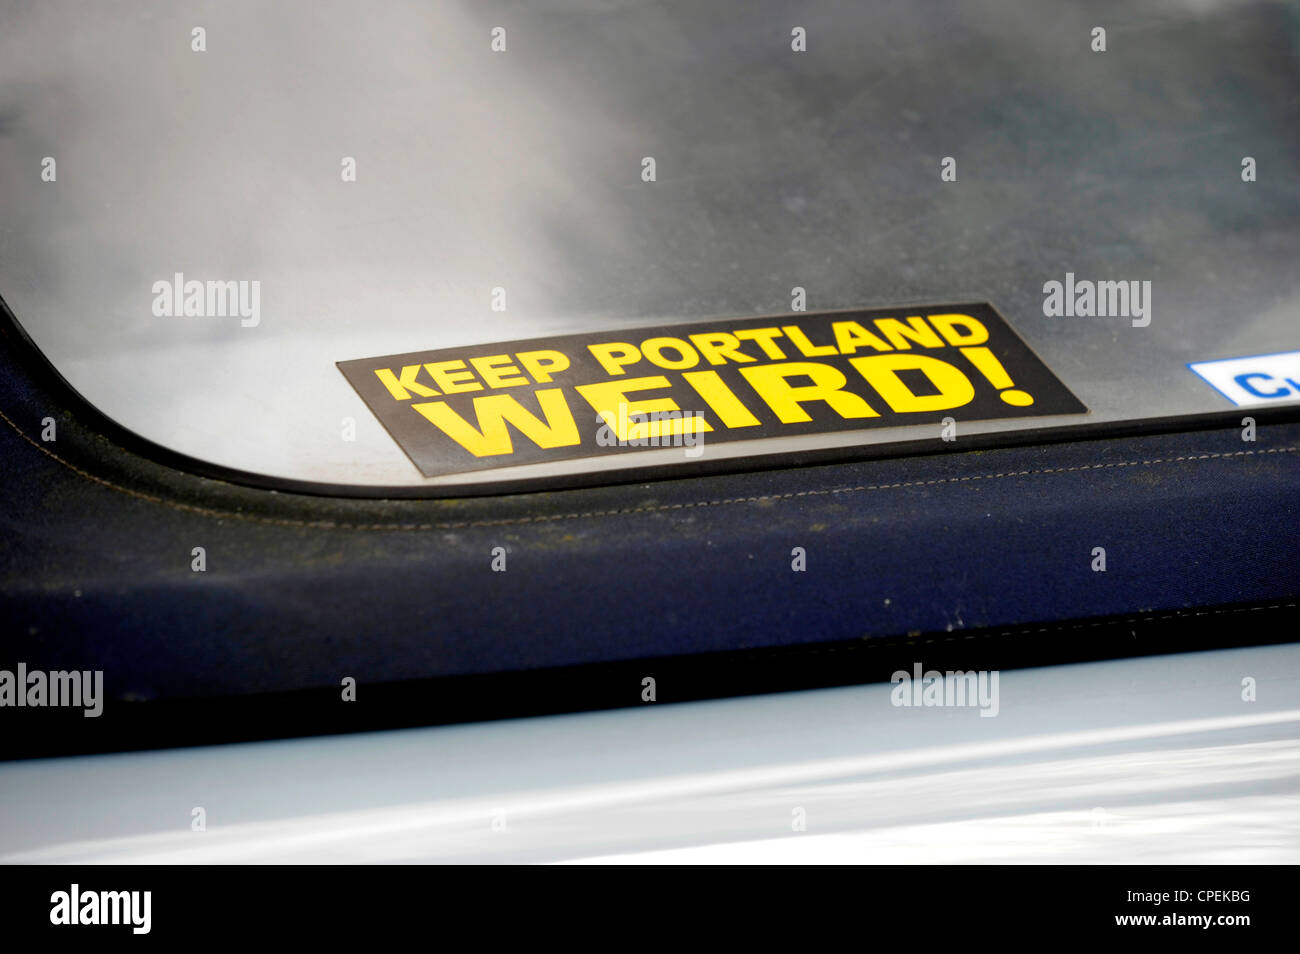 Keep Portland Weird sticker seen on car rear windscreen - Stock Image